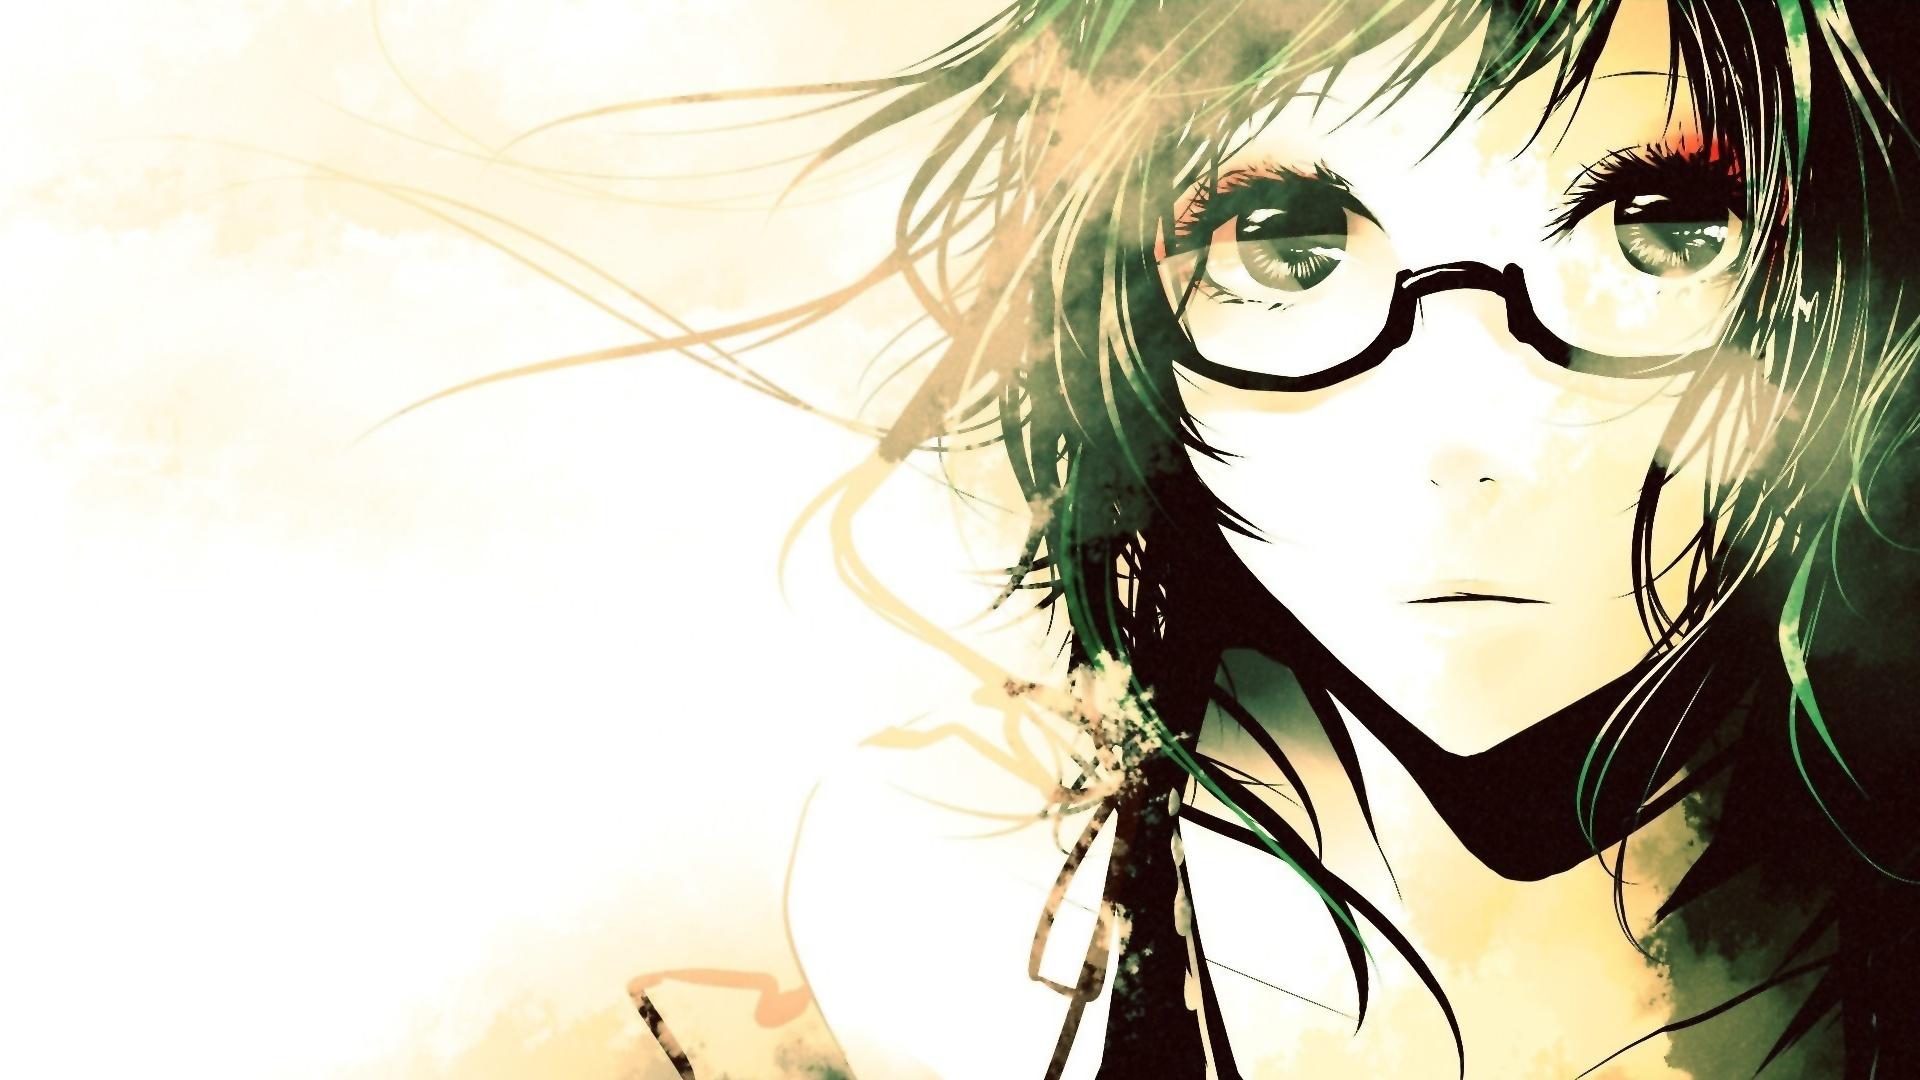 Anime wallpapers taringa Imagenes wallpaper anime